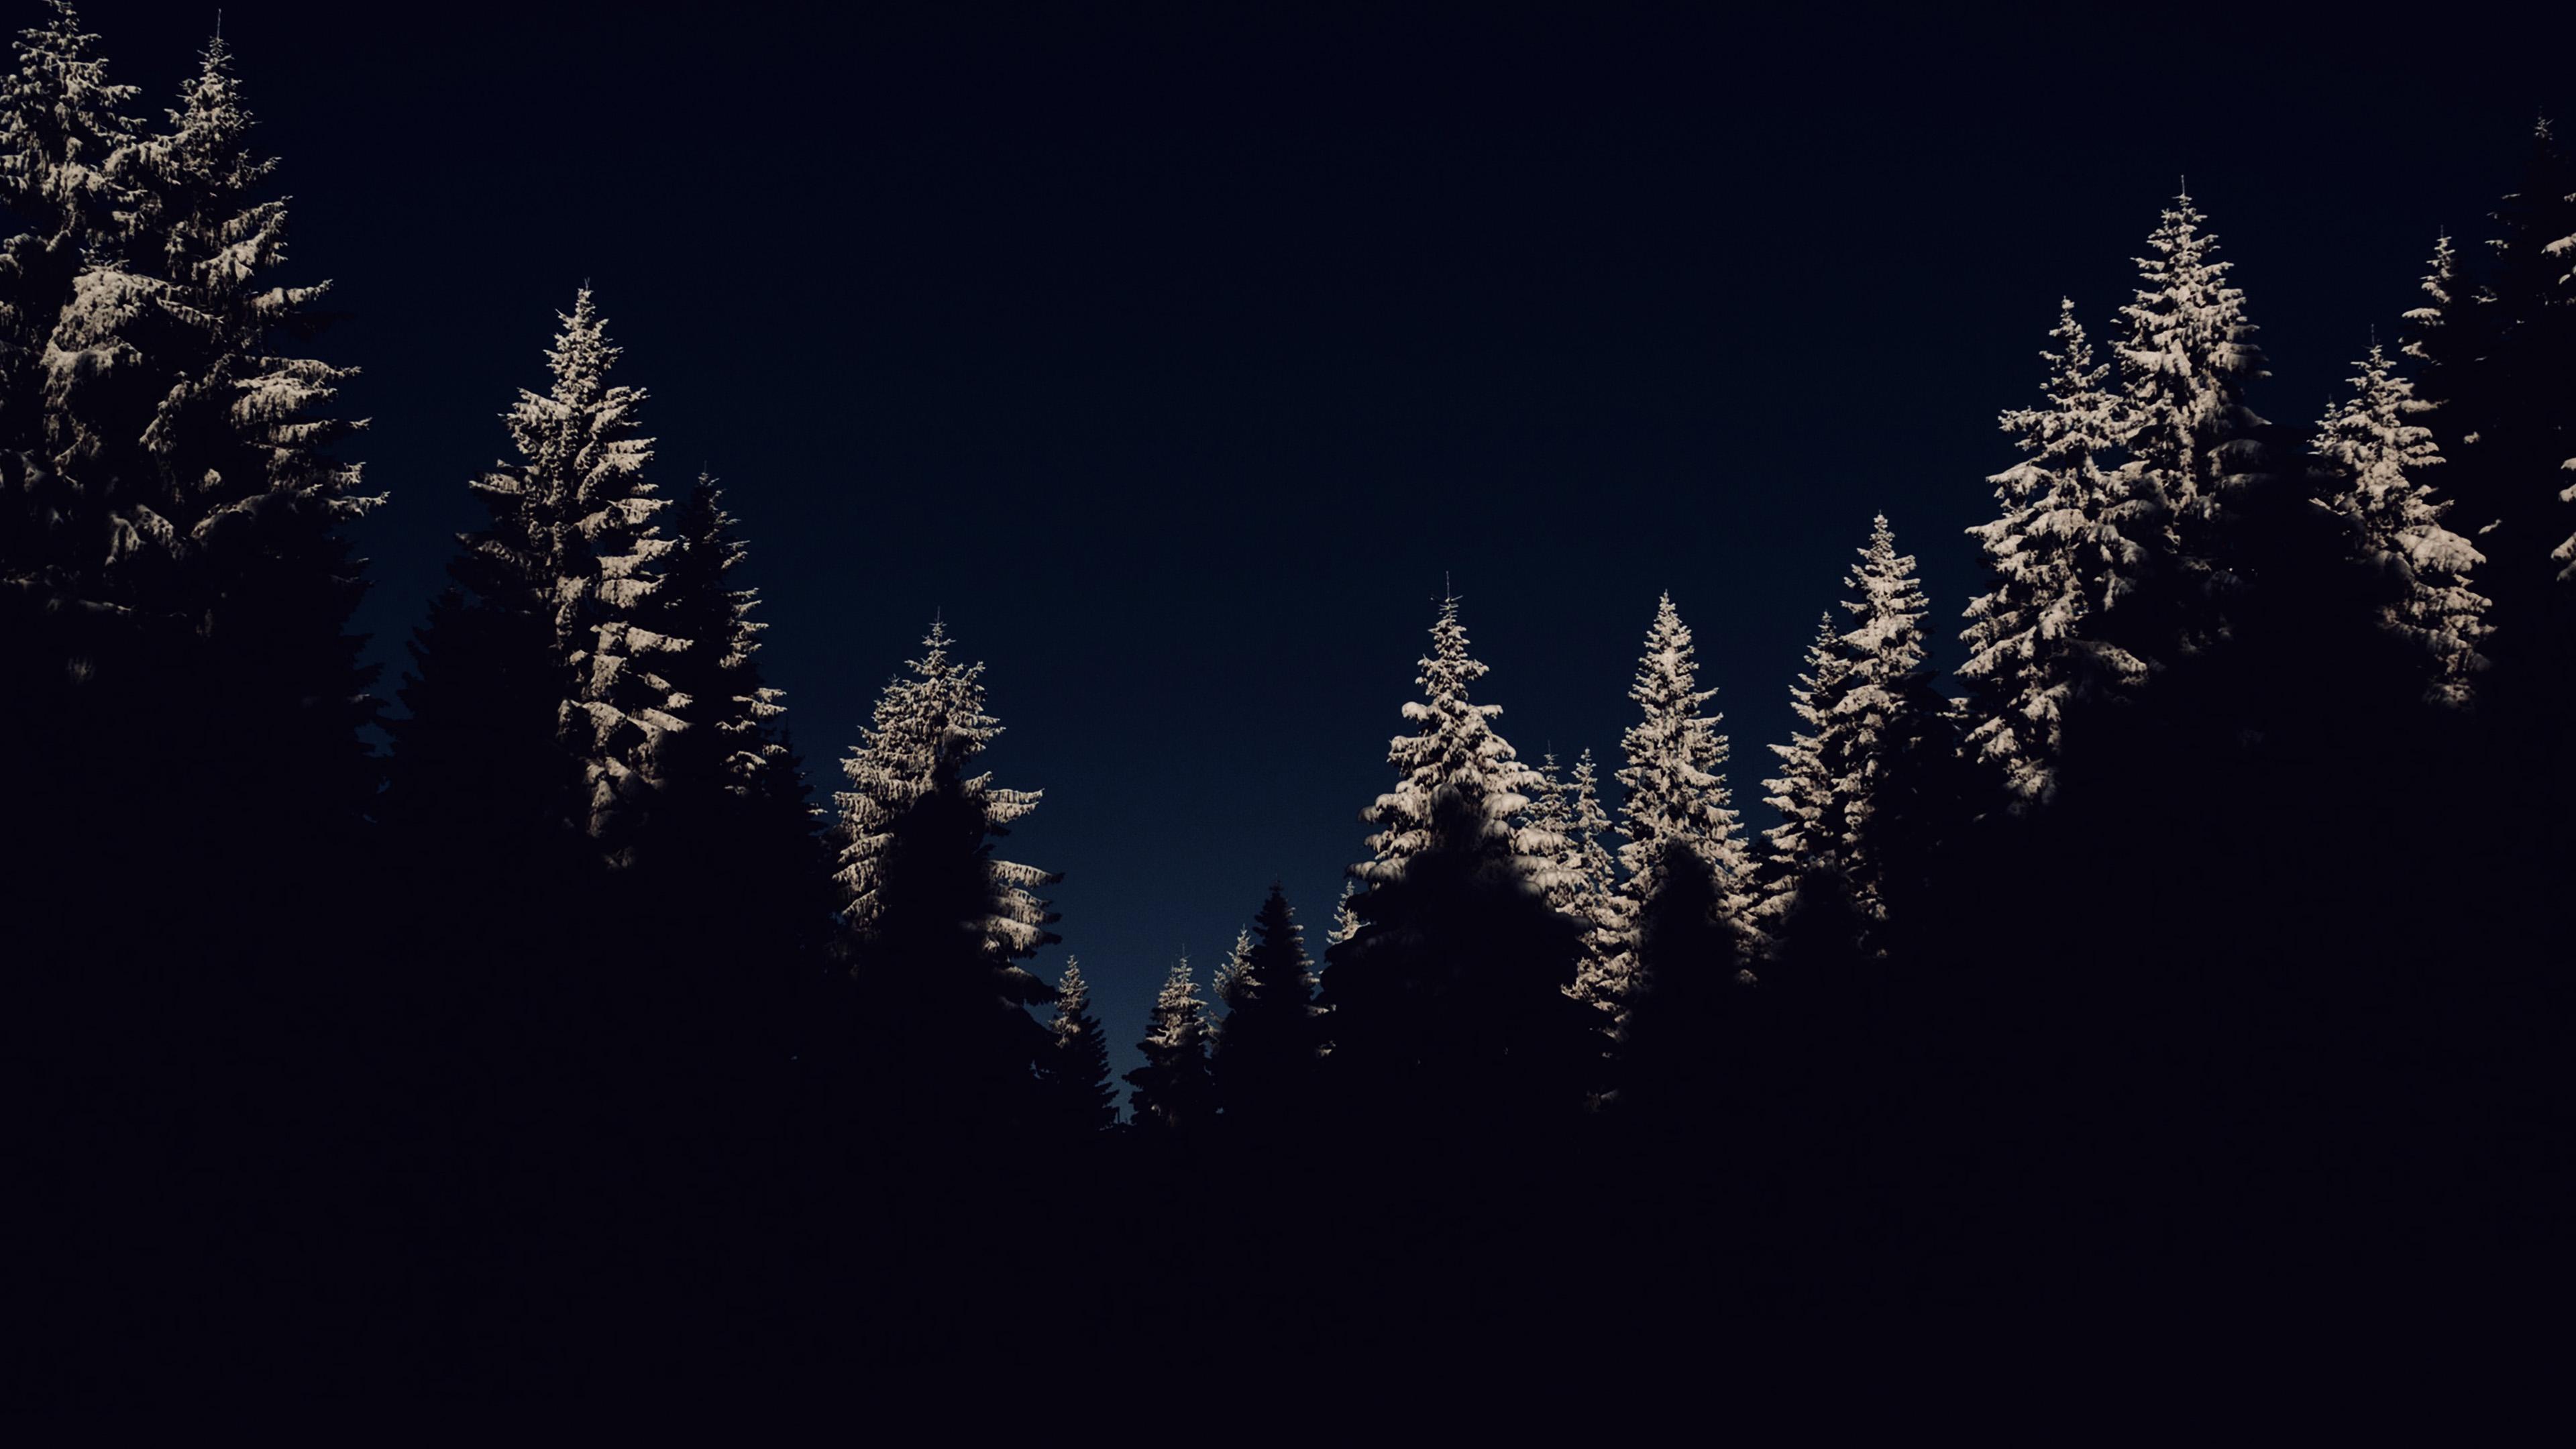 Fall Wood Wallpaper Nl45 Wood Winter Night Mountain Dark Wallpaper